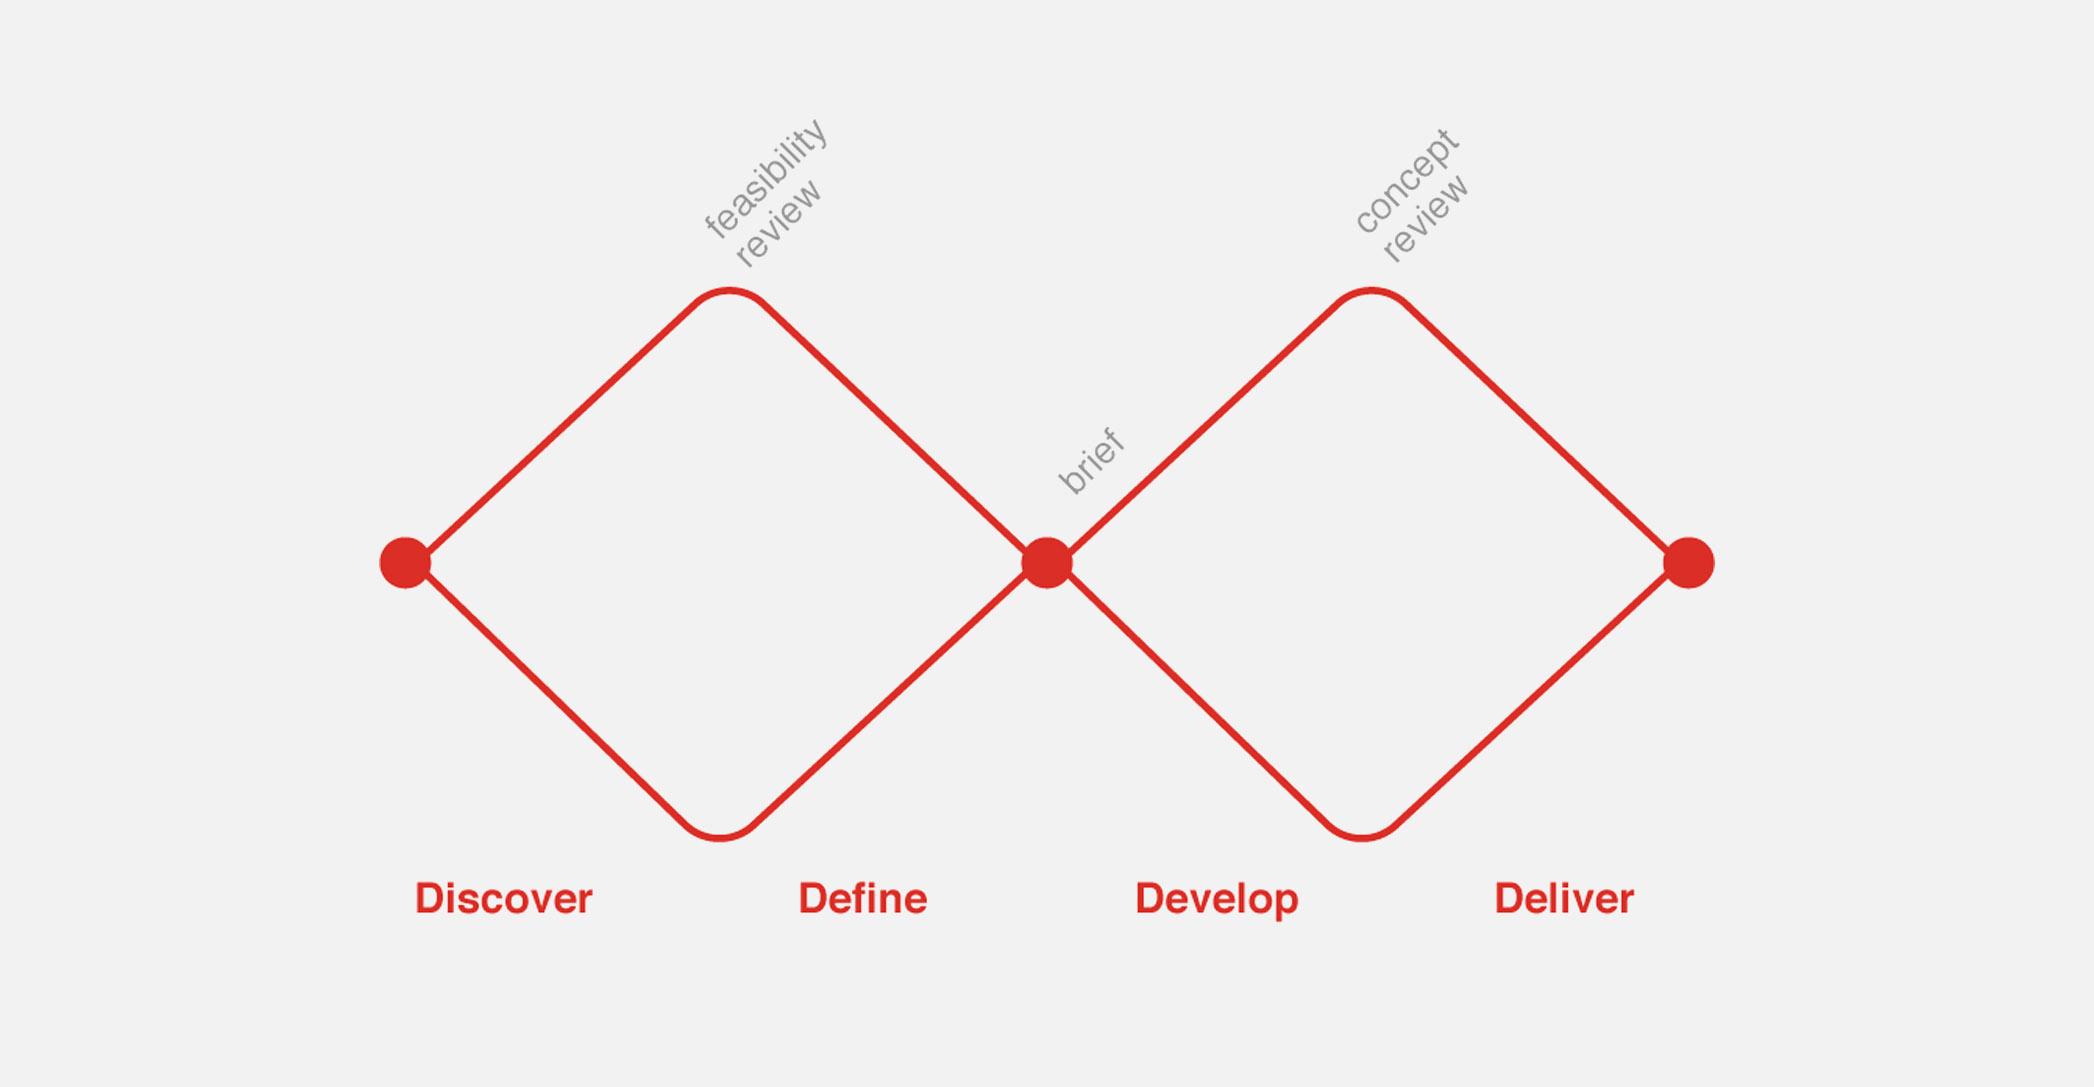 The Design Council's Double Diamond.